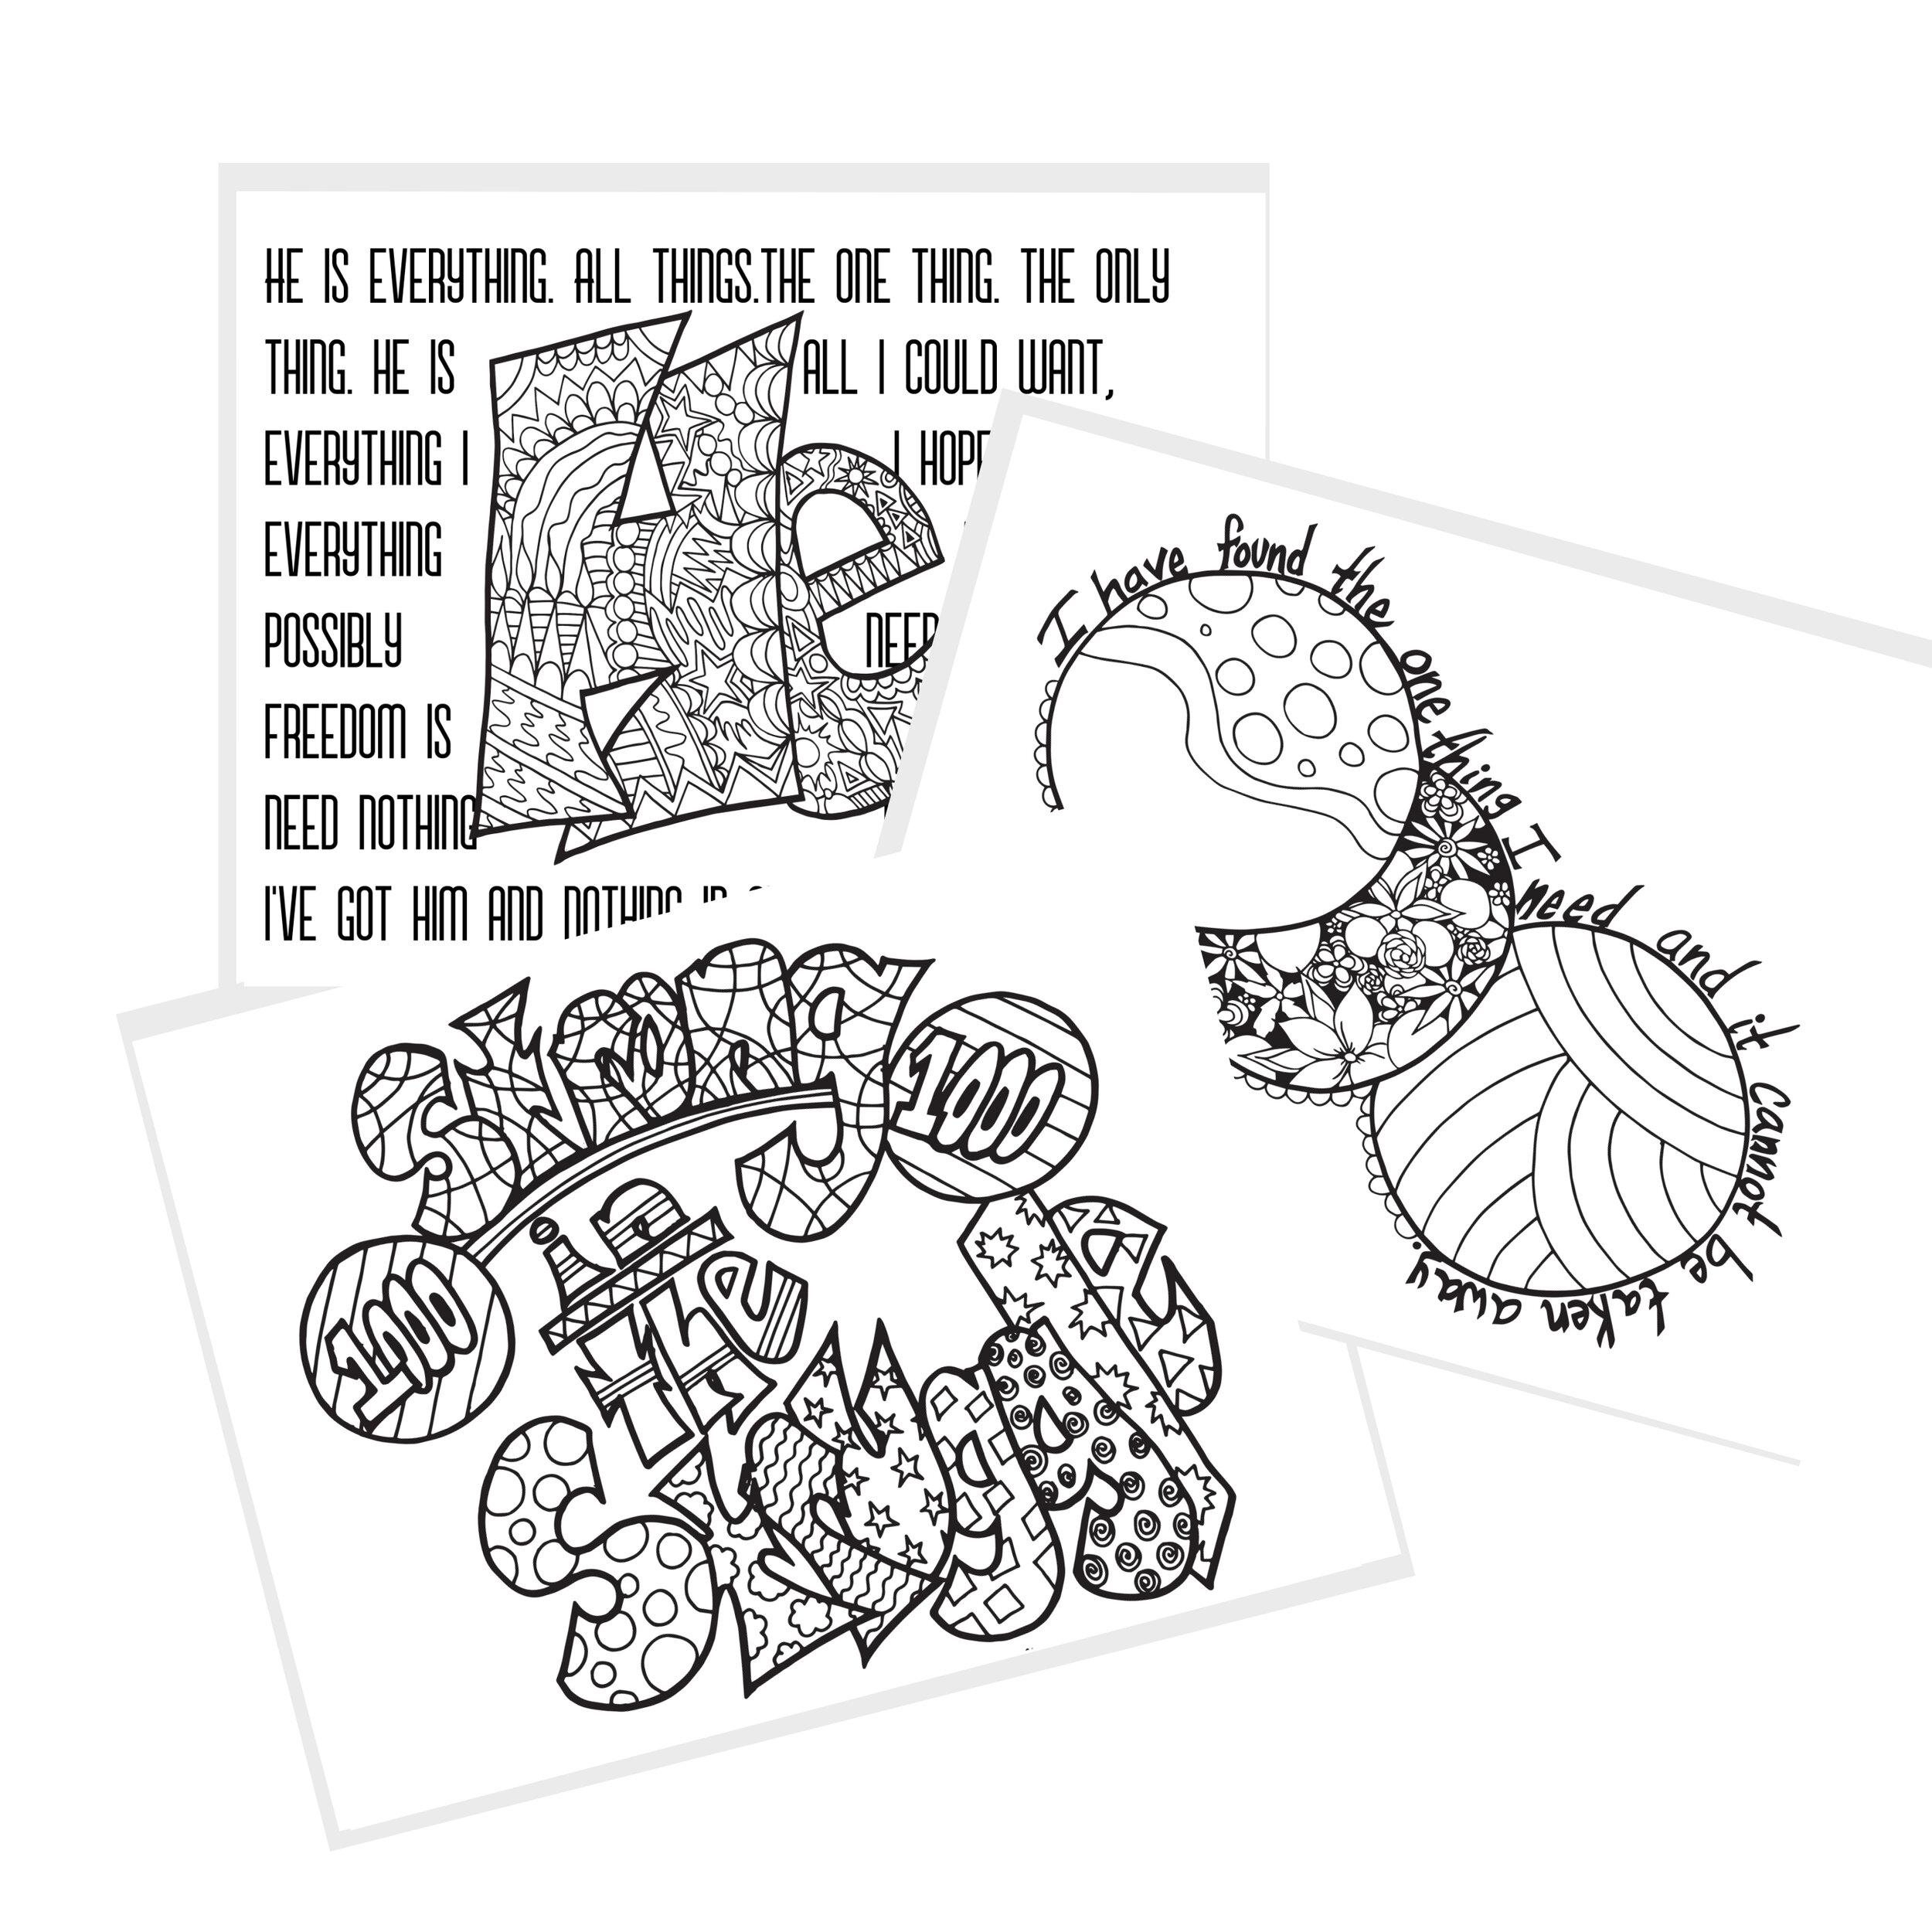 Capturing Thoughts Coloring Book Mockup 2.jpg